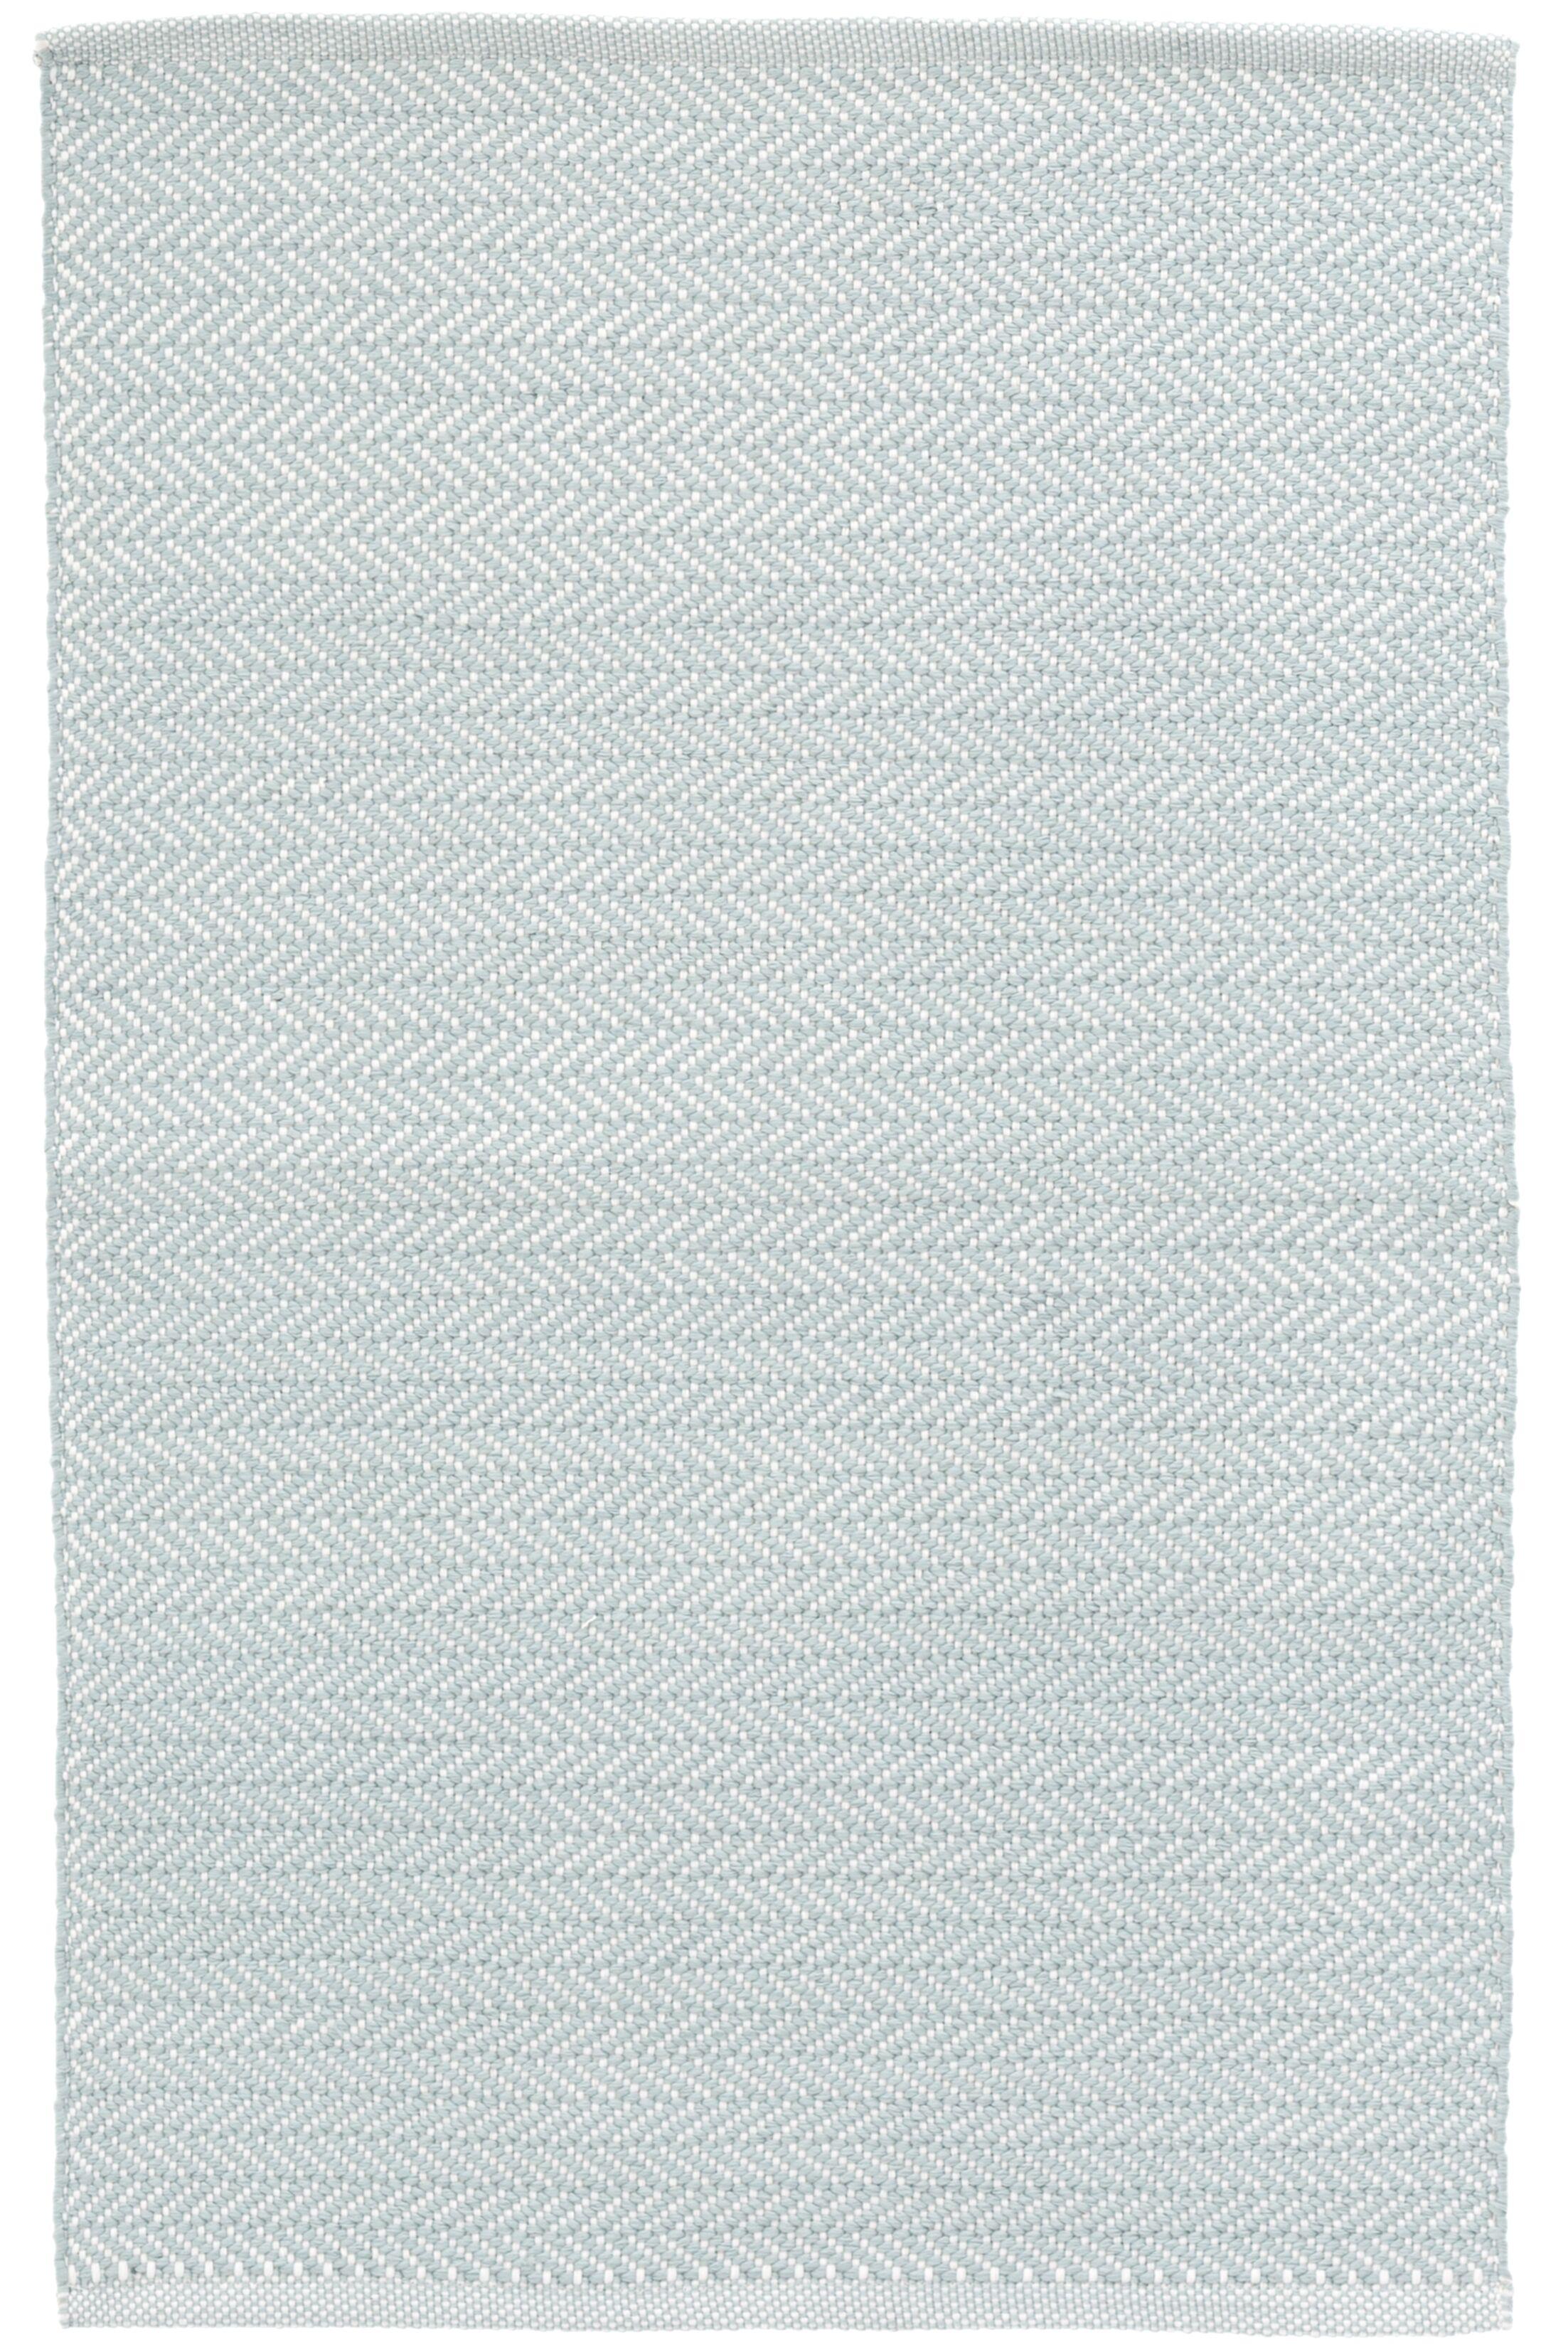 Herringbone Blue/White Indoor/Outdoor Area Rug Rug Size: Rectangle 5' x 8'